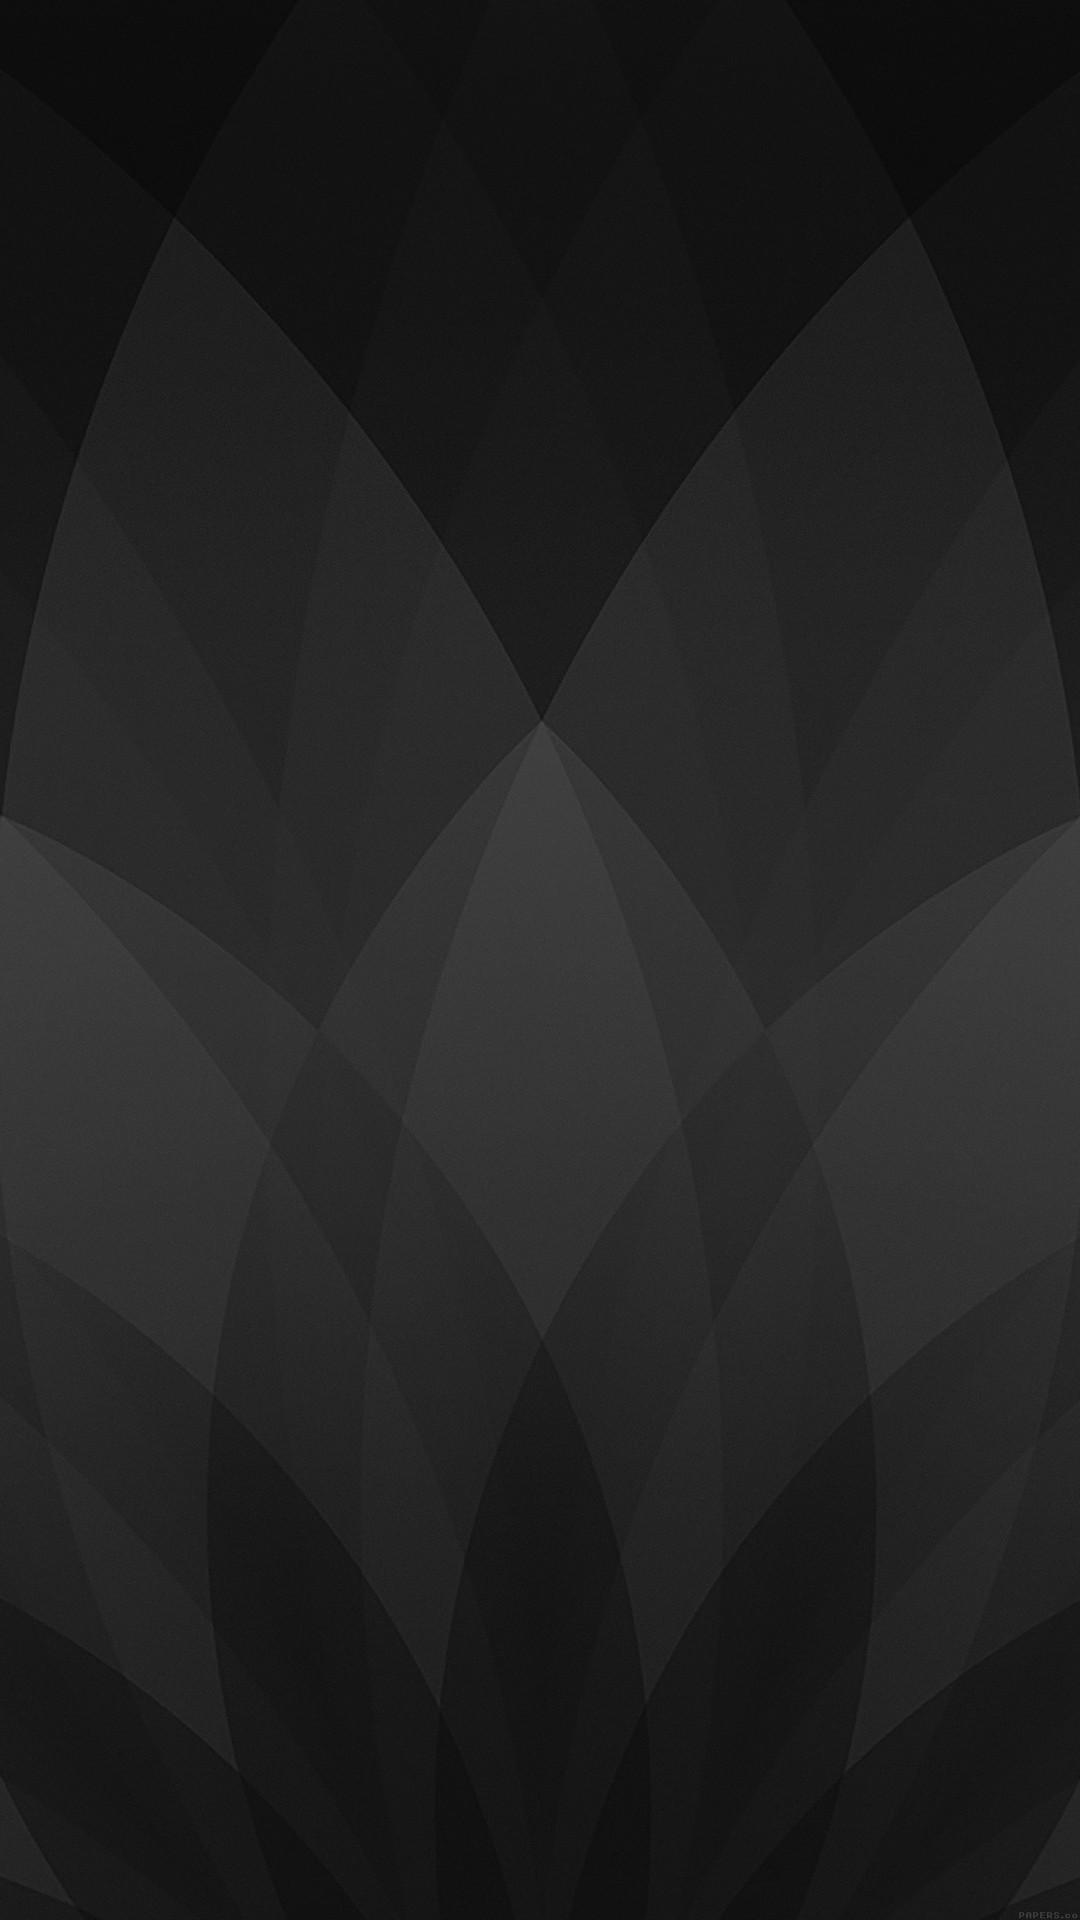 Dark ios wallpaper